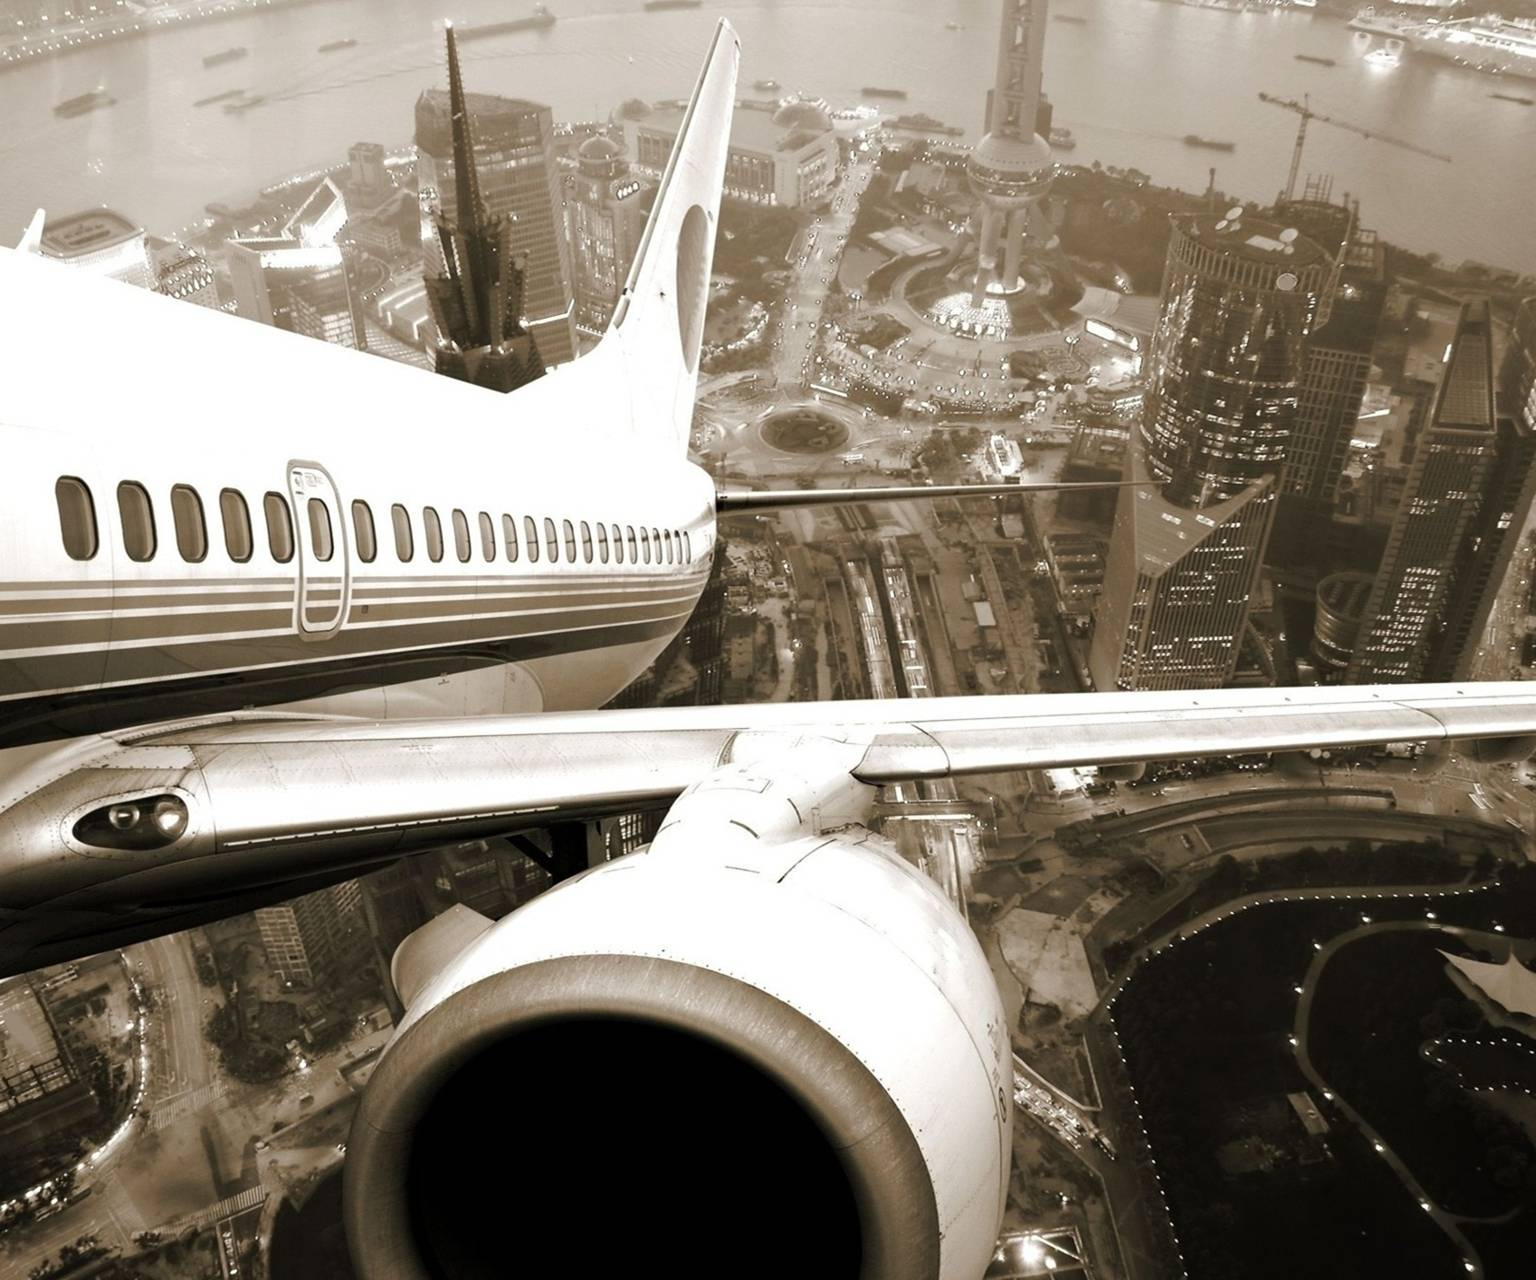 aircraft taking of